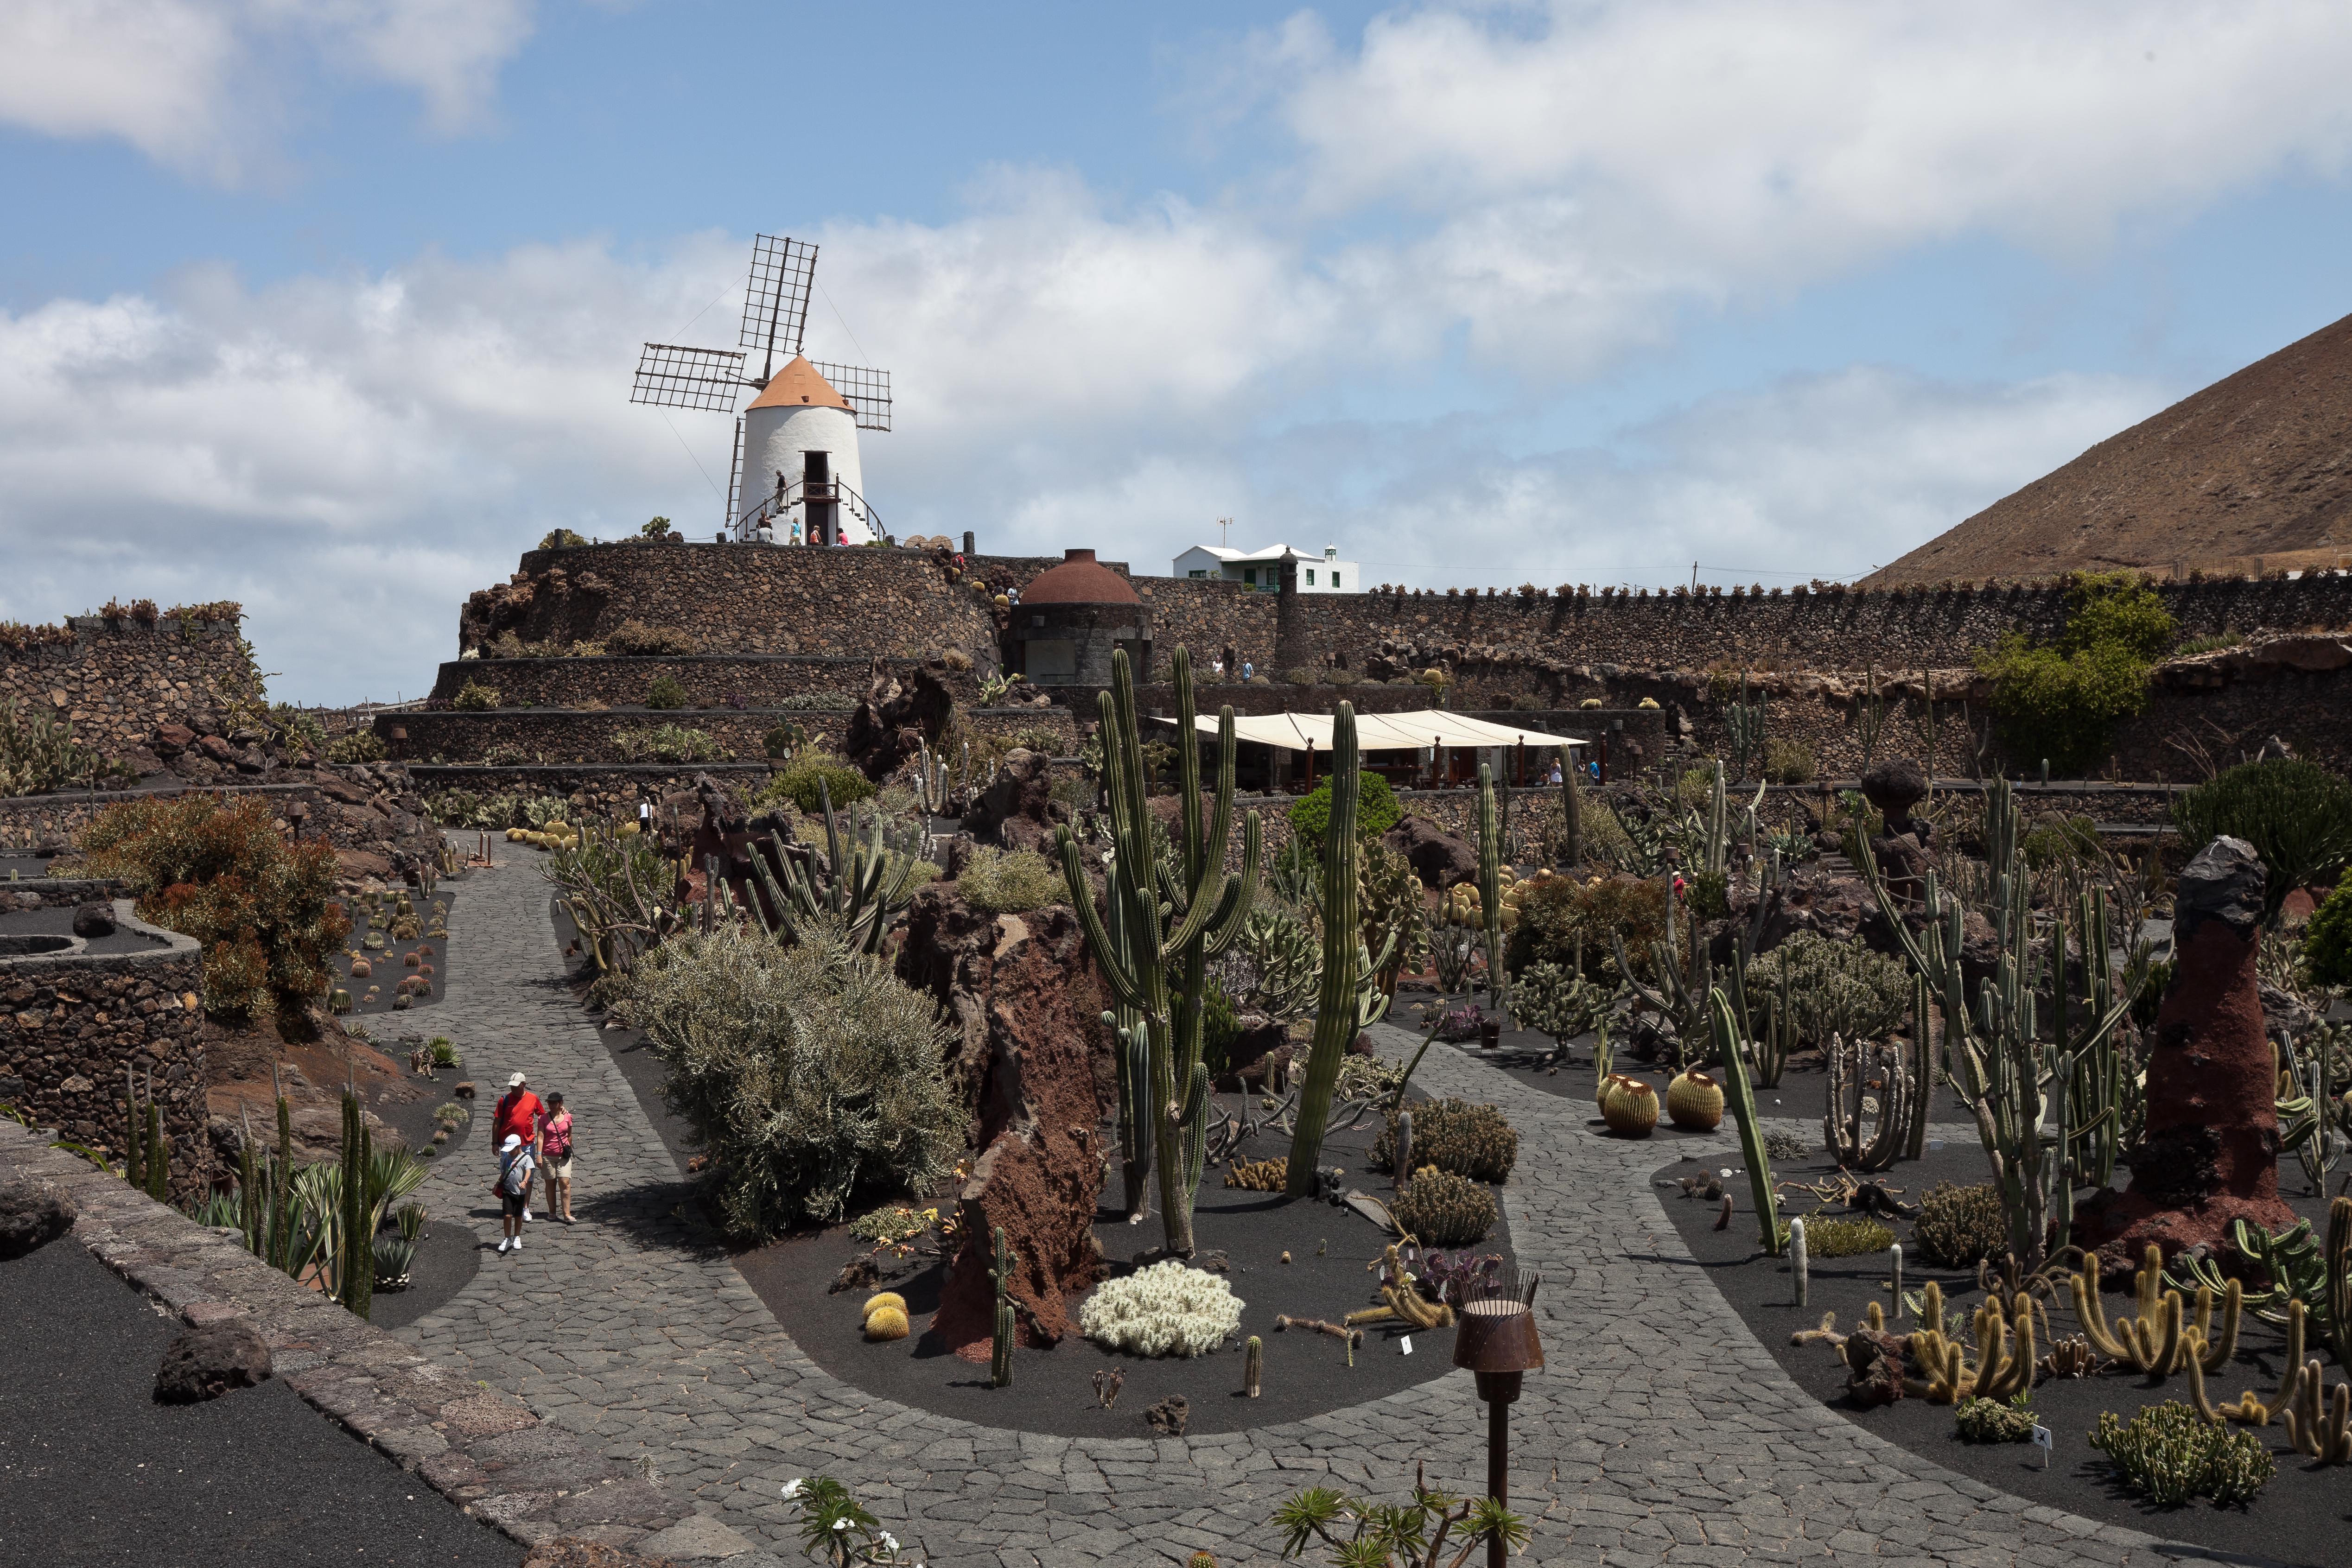 File Guatiza Jardn de Cactus Lanzarote J42 Wikimedia